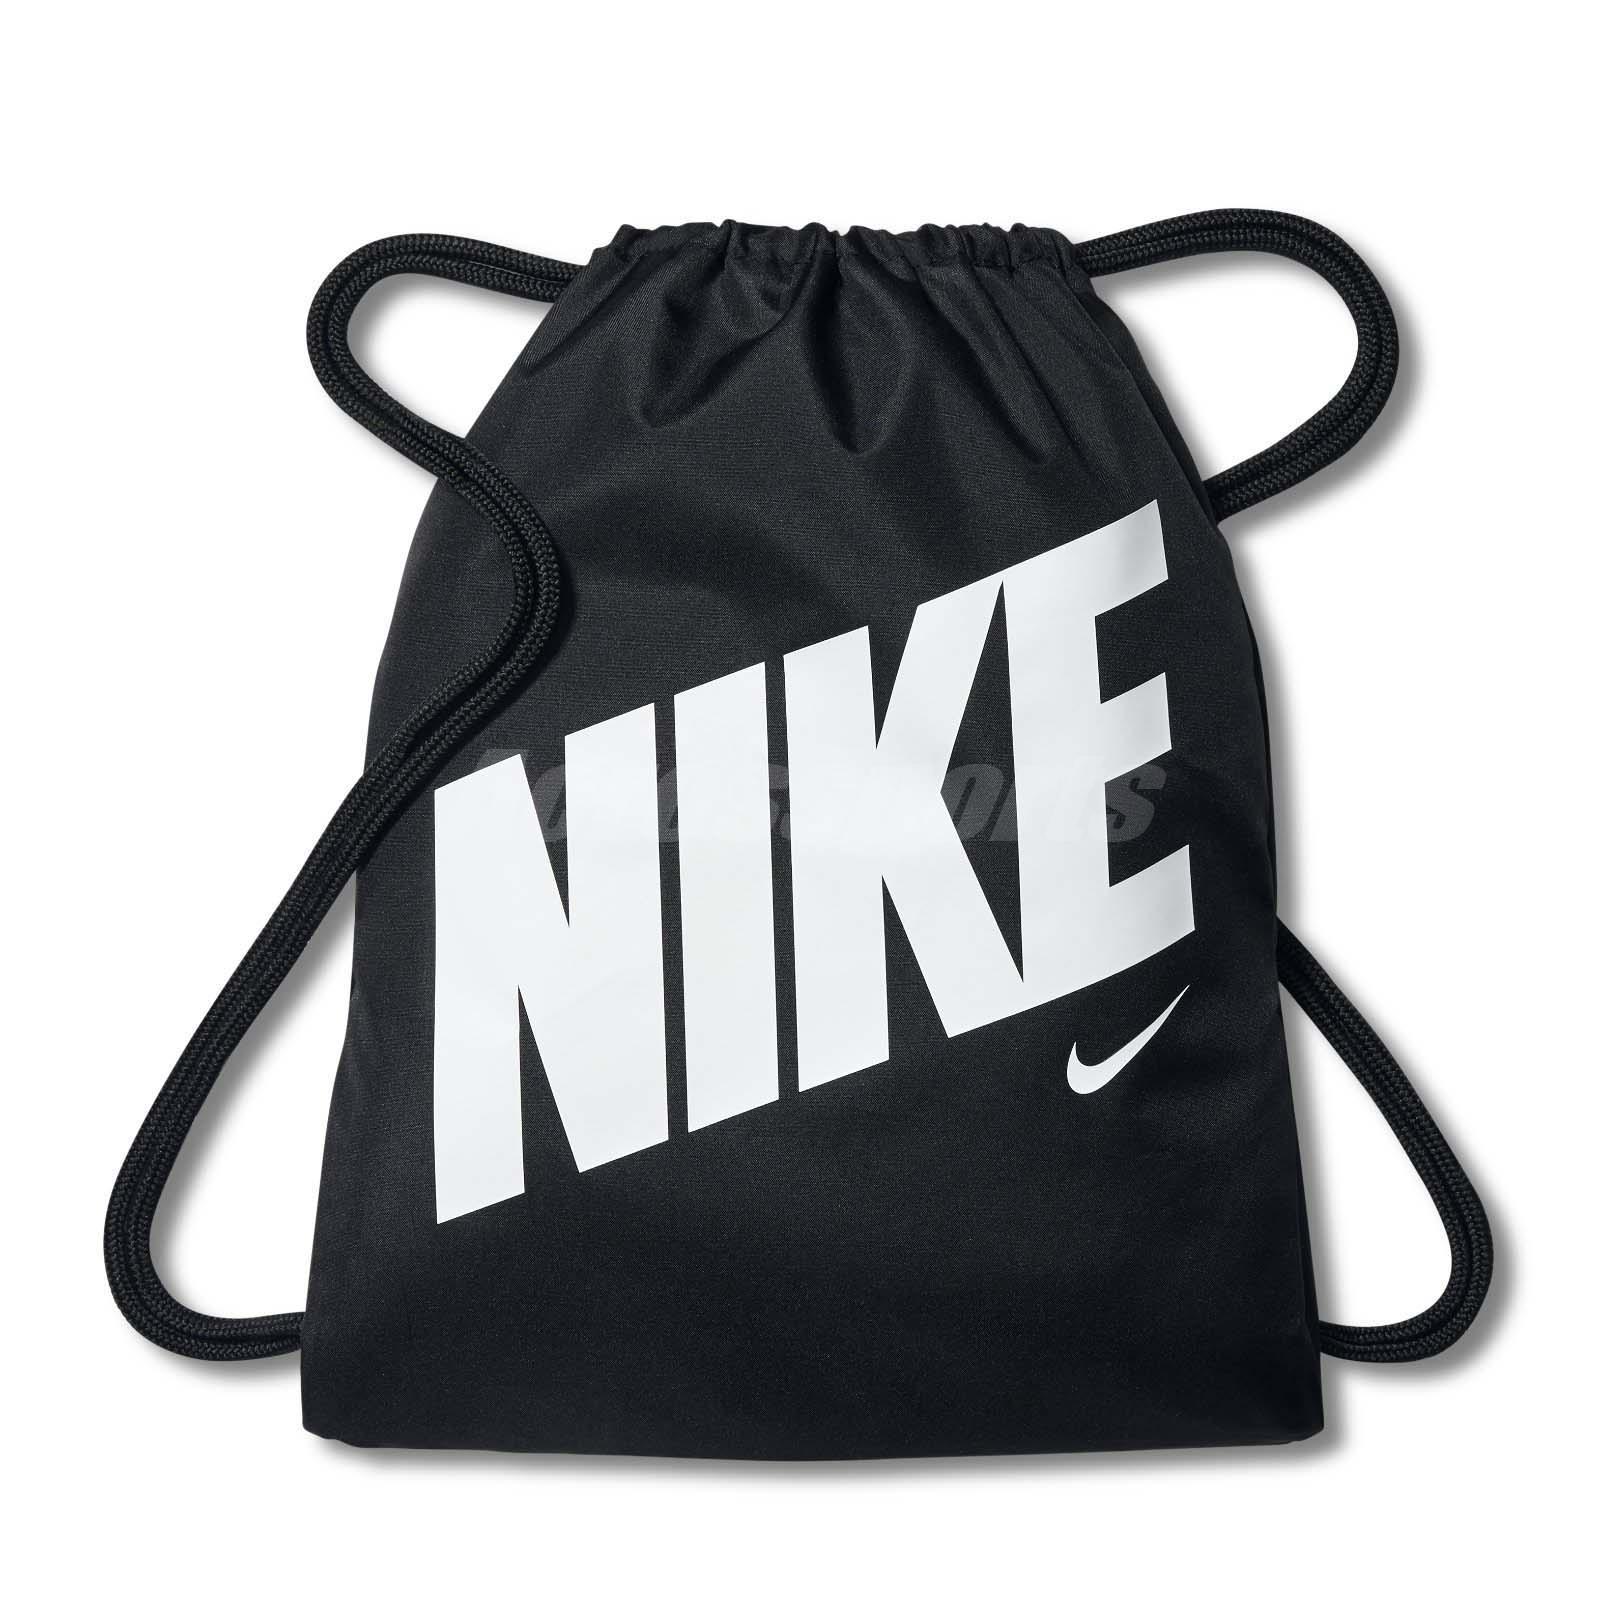 Details about Nike Unisex Young Athletes Gymsack Black White Bag Gym Sport  BA5262-015 2827e64bda8f5